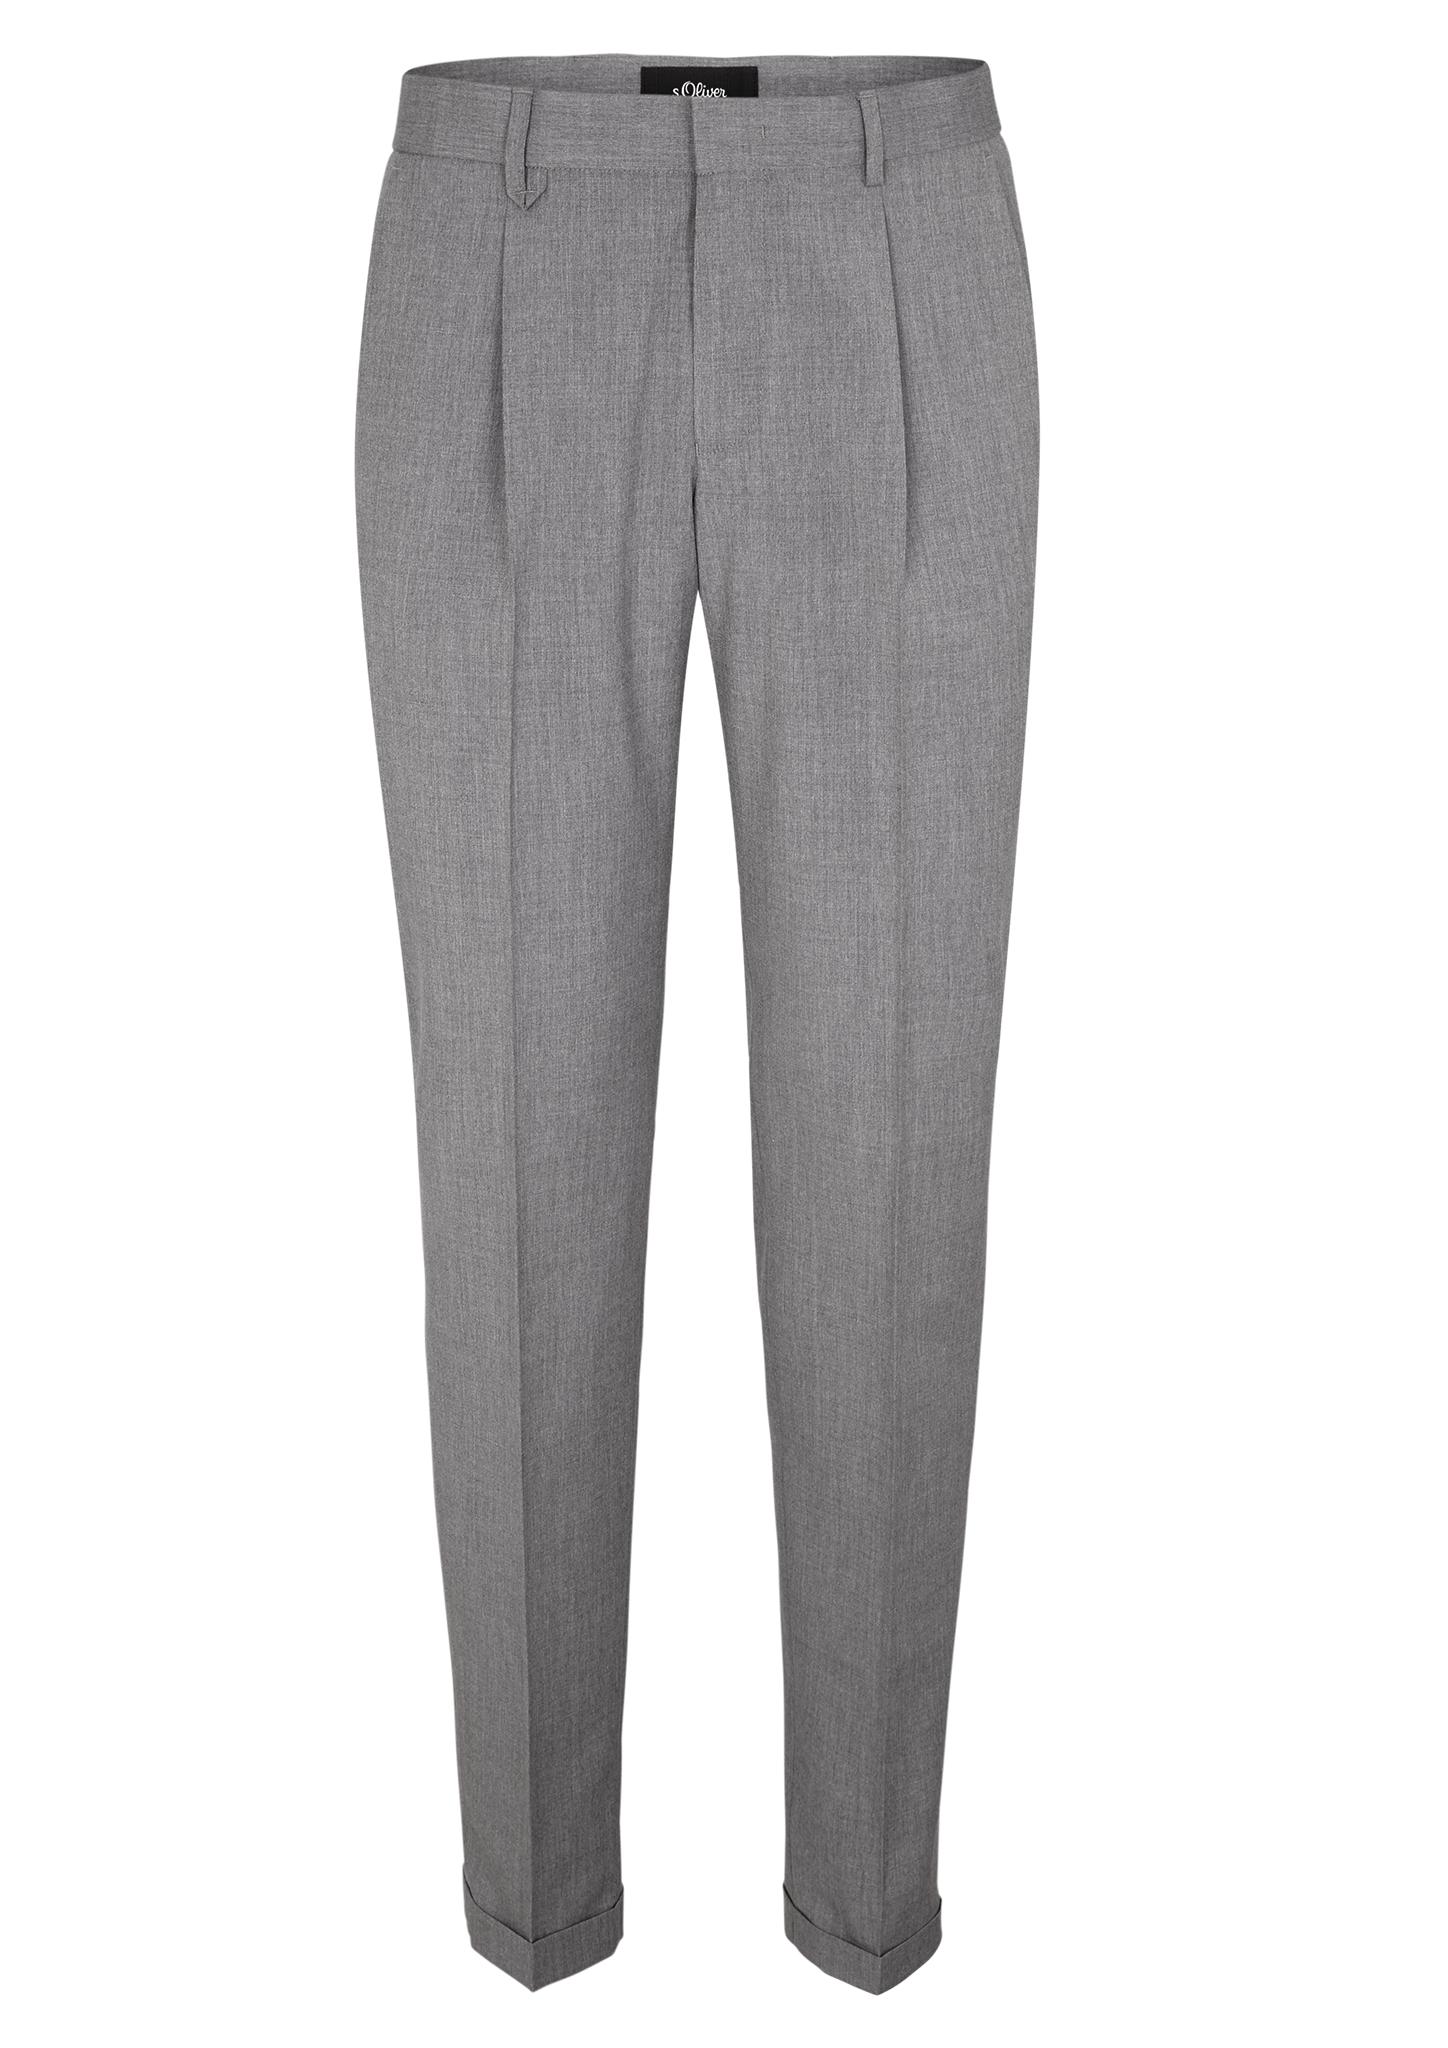 Hose | Bekleidung | Grau/schwarz | 66% polyester -  20% viskose -  12% schurwolle -  2% elasthan | s.Oliver BLACK LABEL